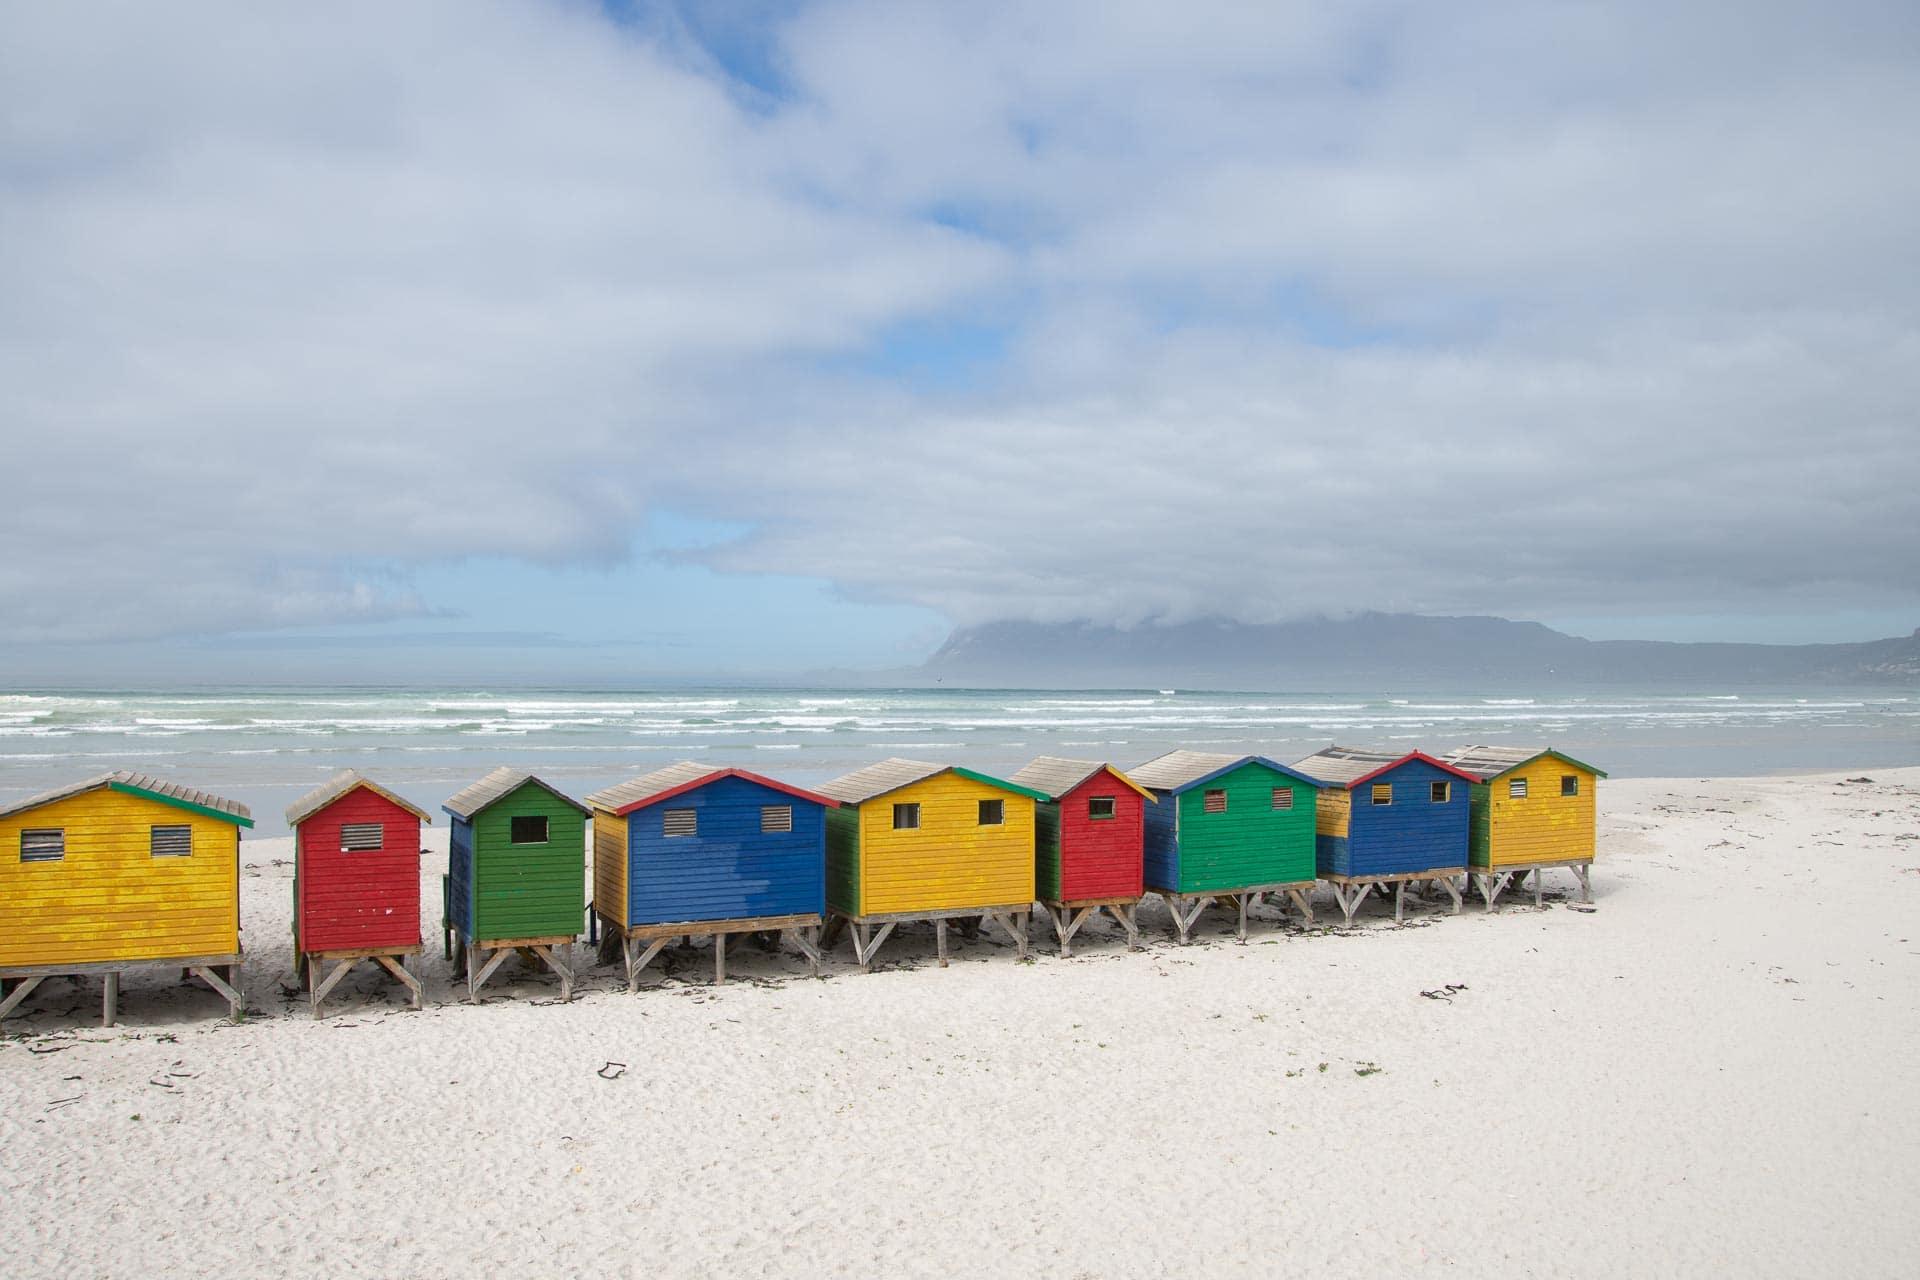 Kapstadt-Suedafrika-Globetrotter-Select-1036